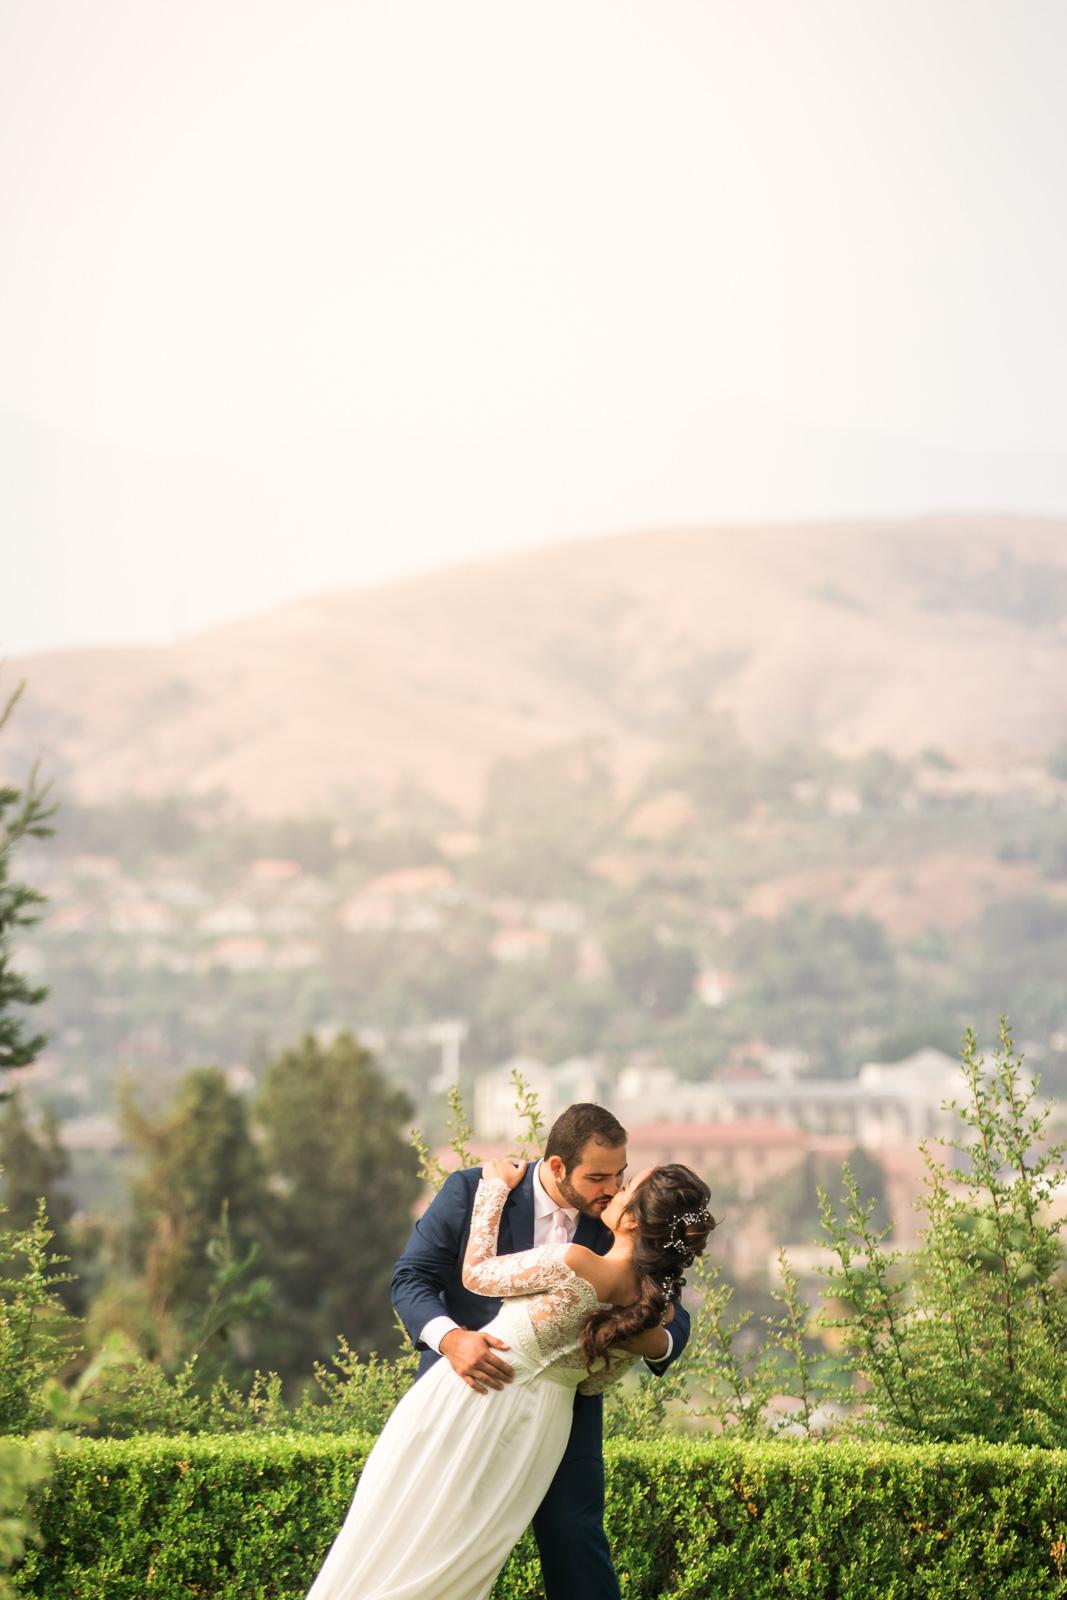 67_Angel-Brea-Orange-County_Joseph-Barber-Wedding-Photography.jpg